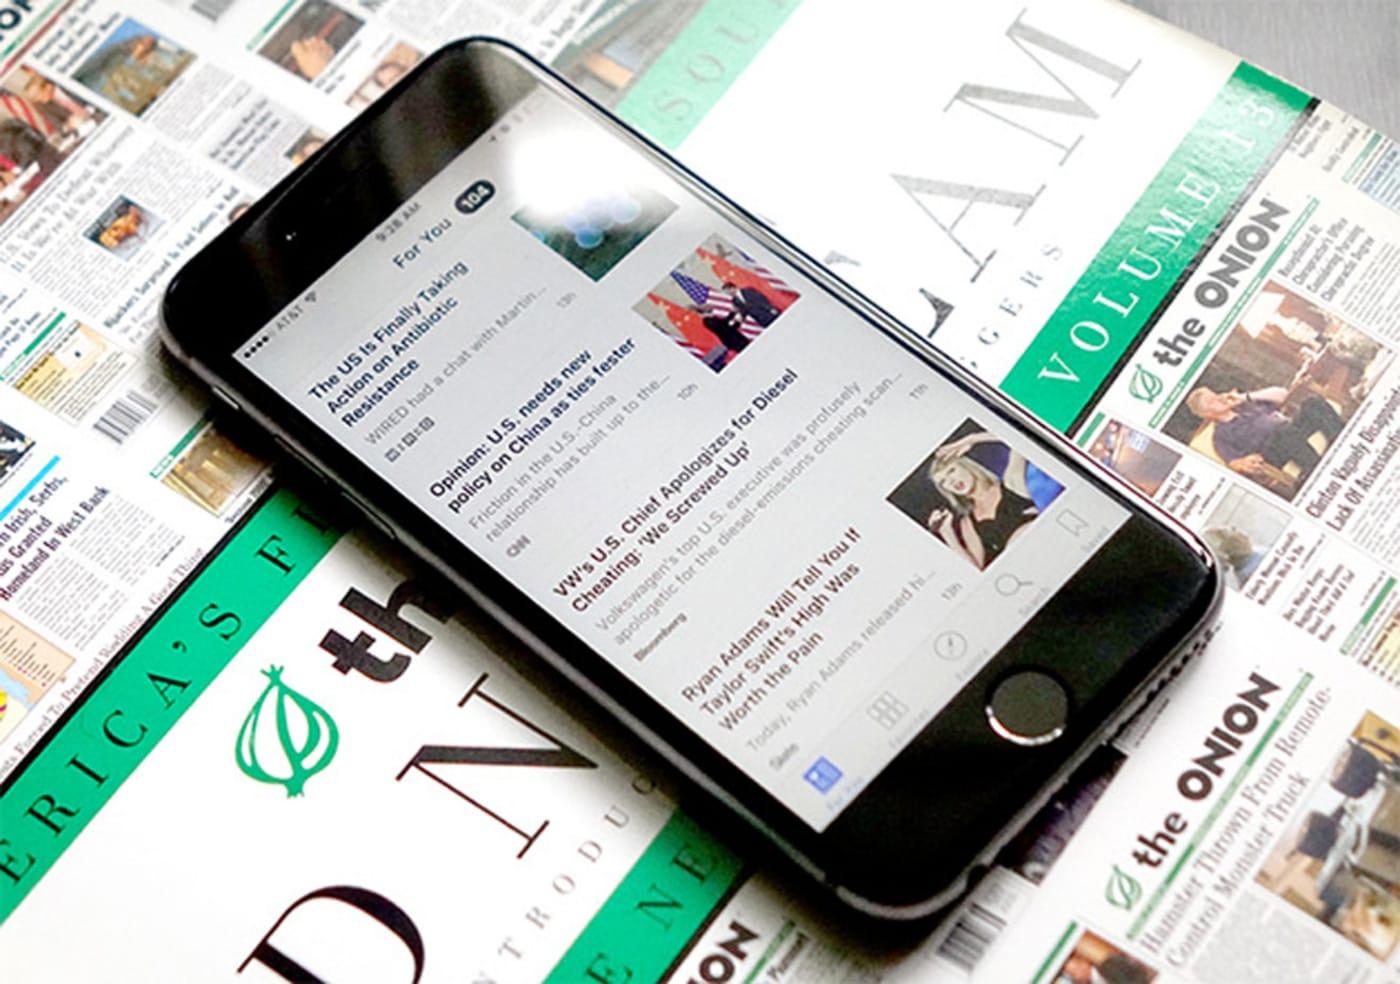 Apple non sa la gente sta usando le sue notizie app